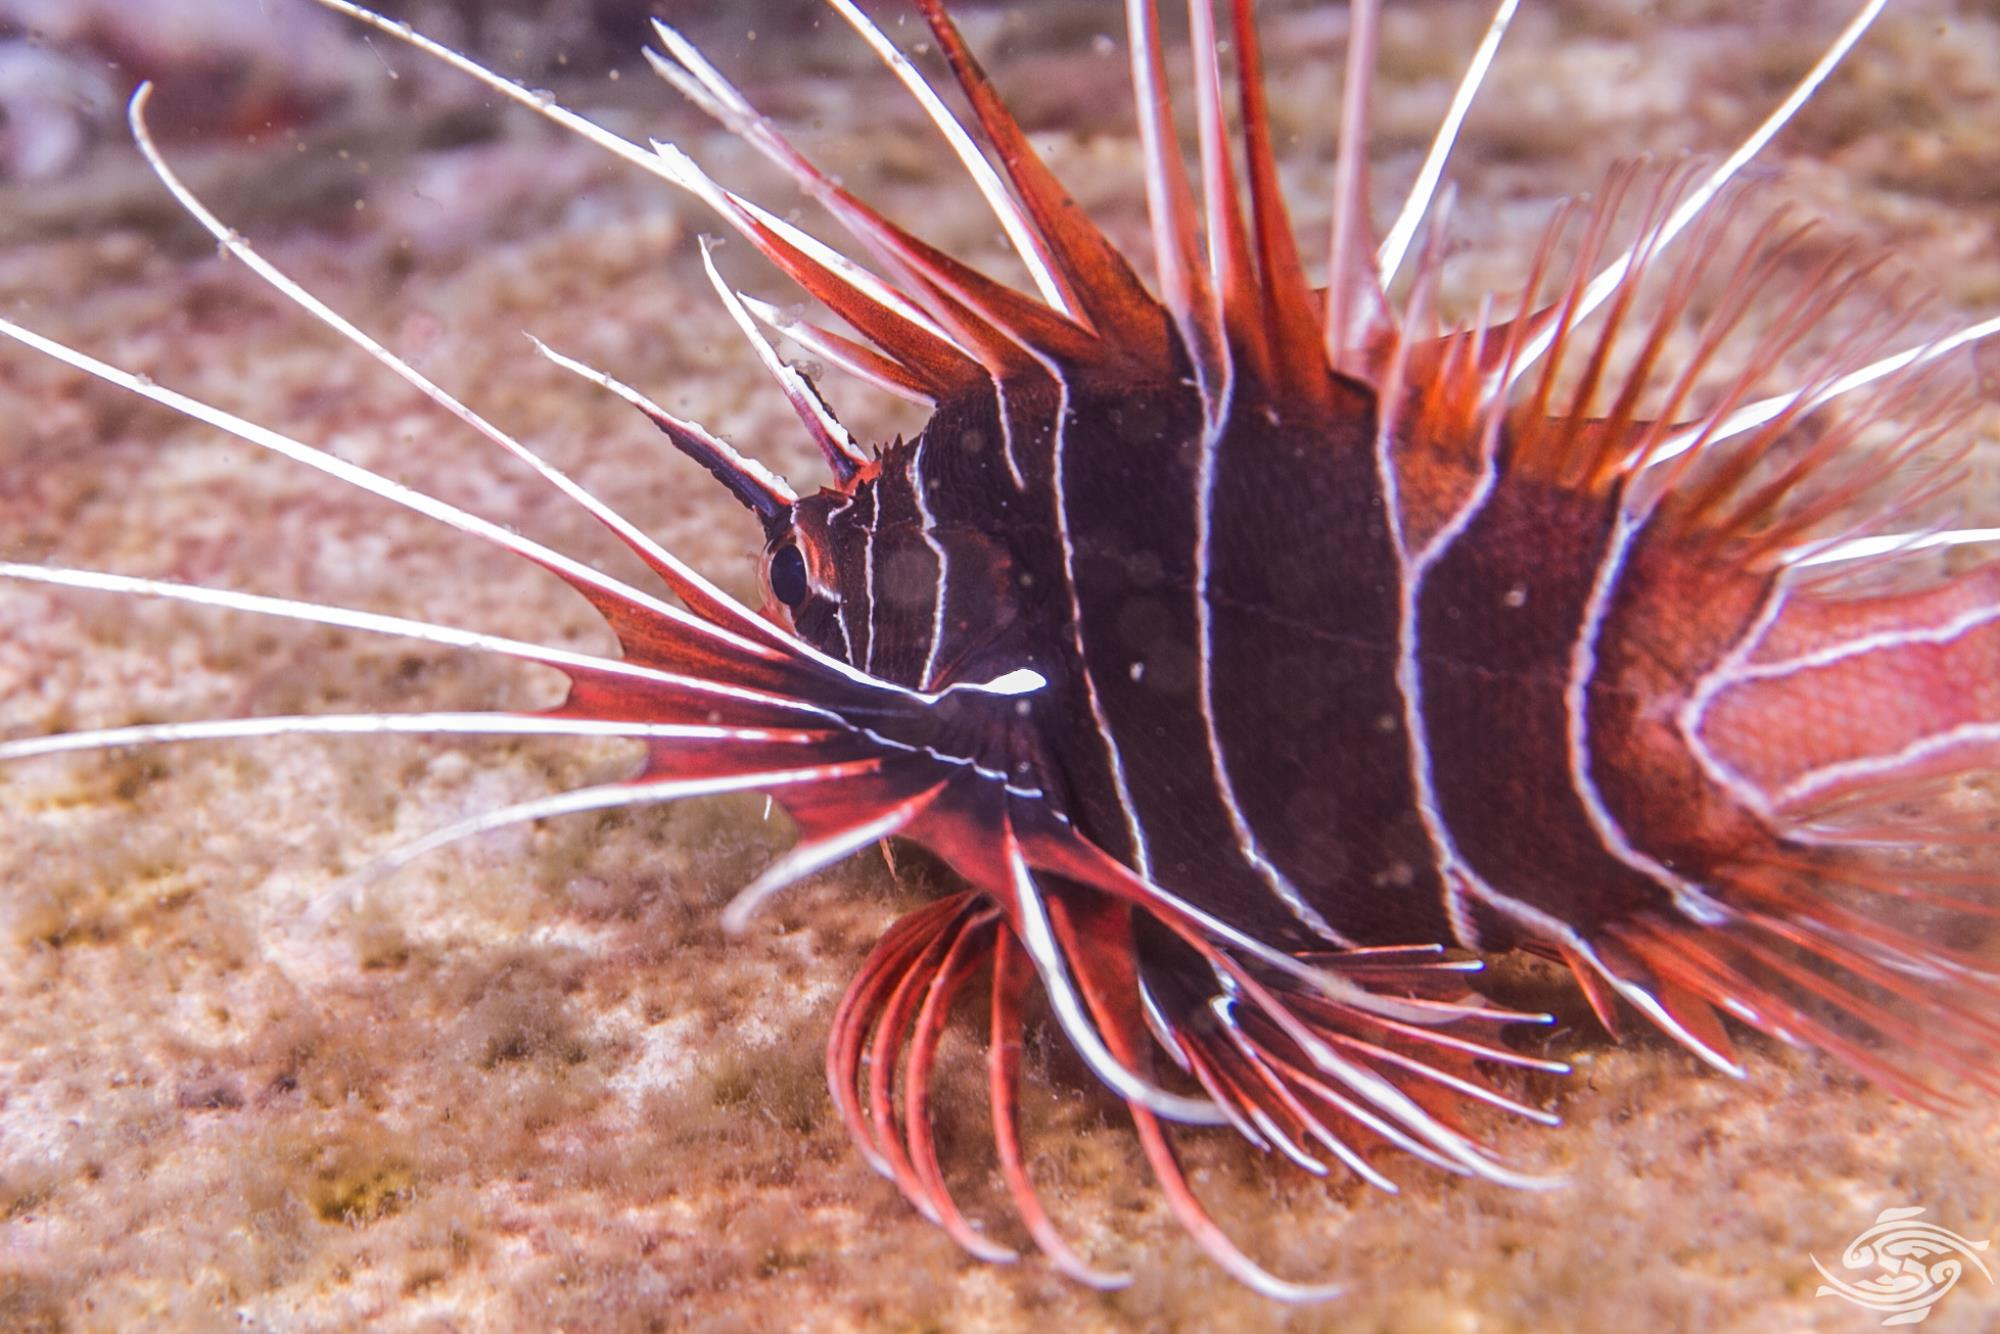 clearfin lionfish, tailbar lionfish, radiata lionfish, fireworks fish, or radial firefish (Pterois radiata)